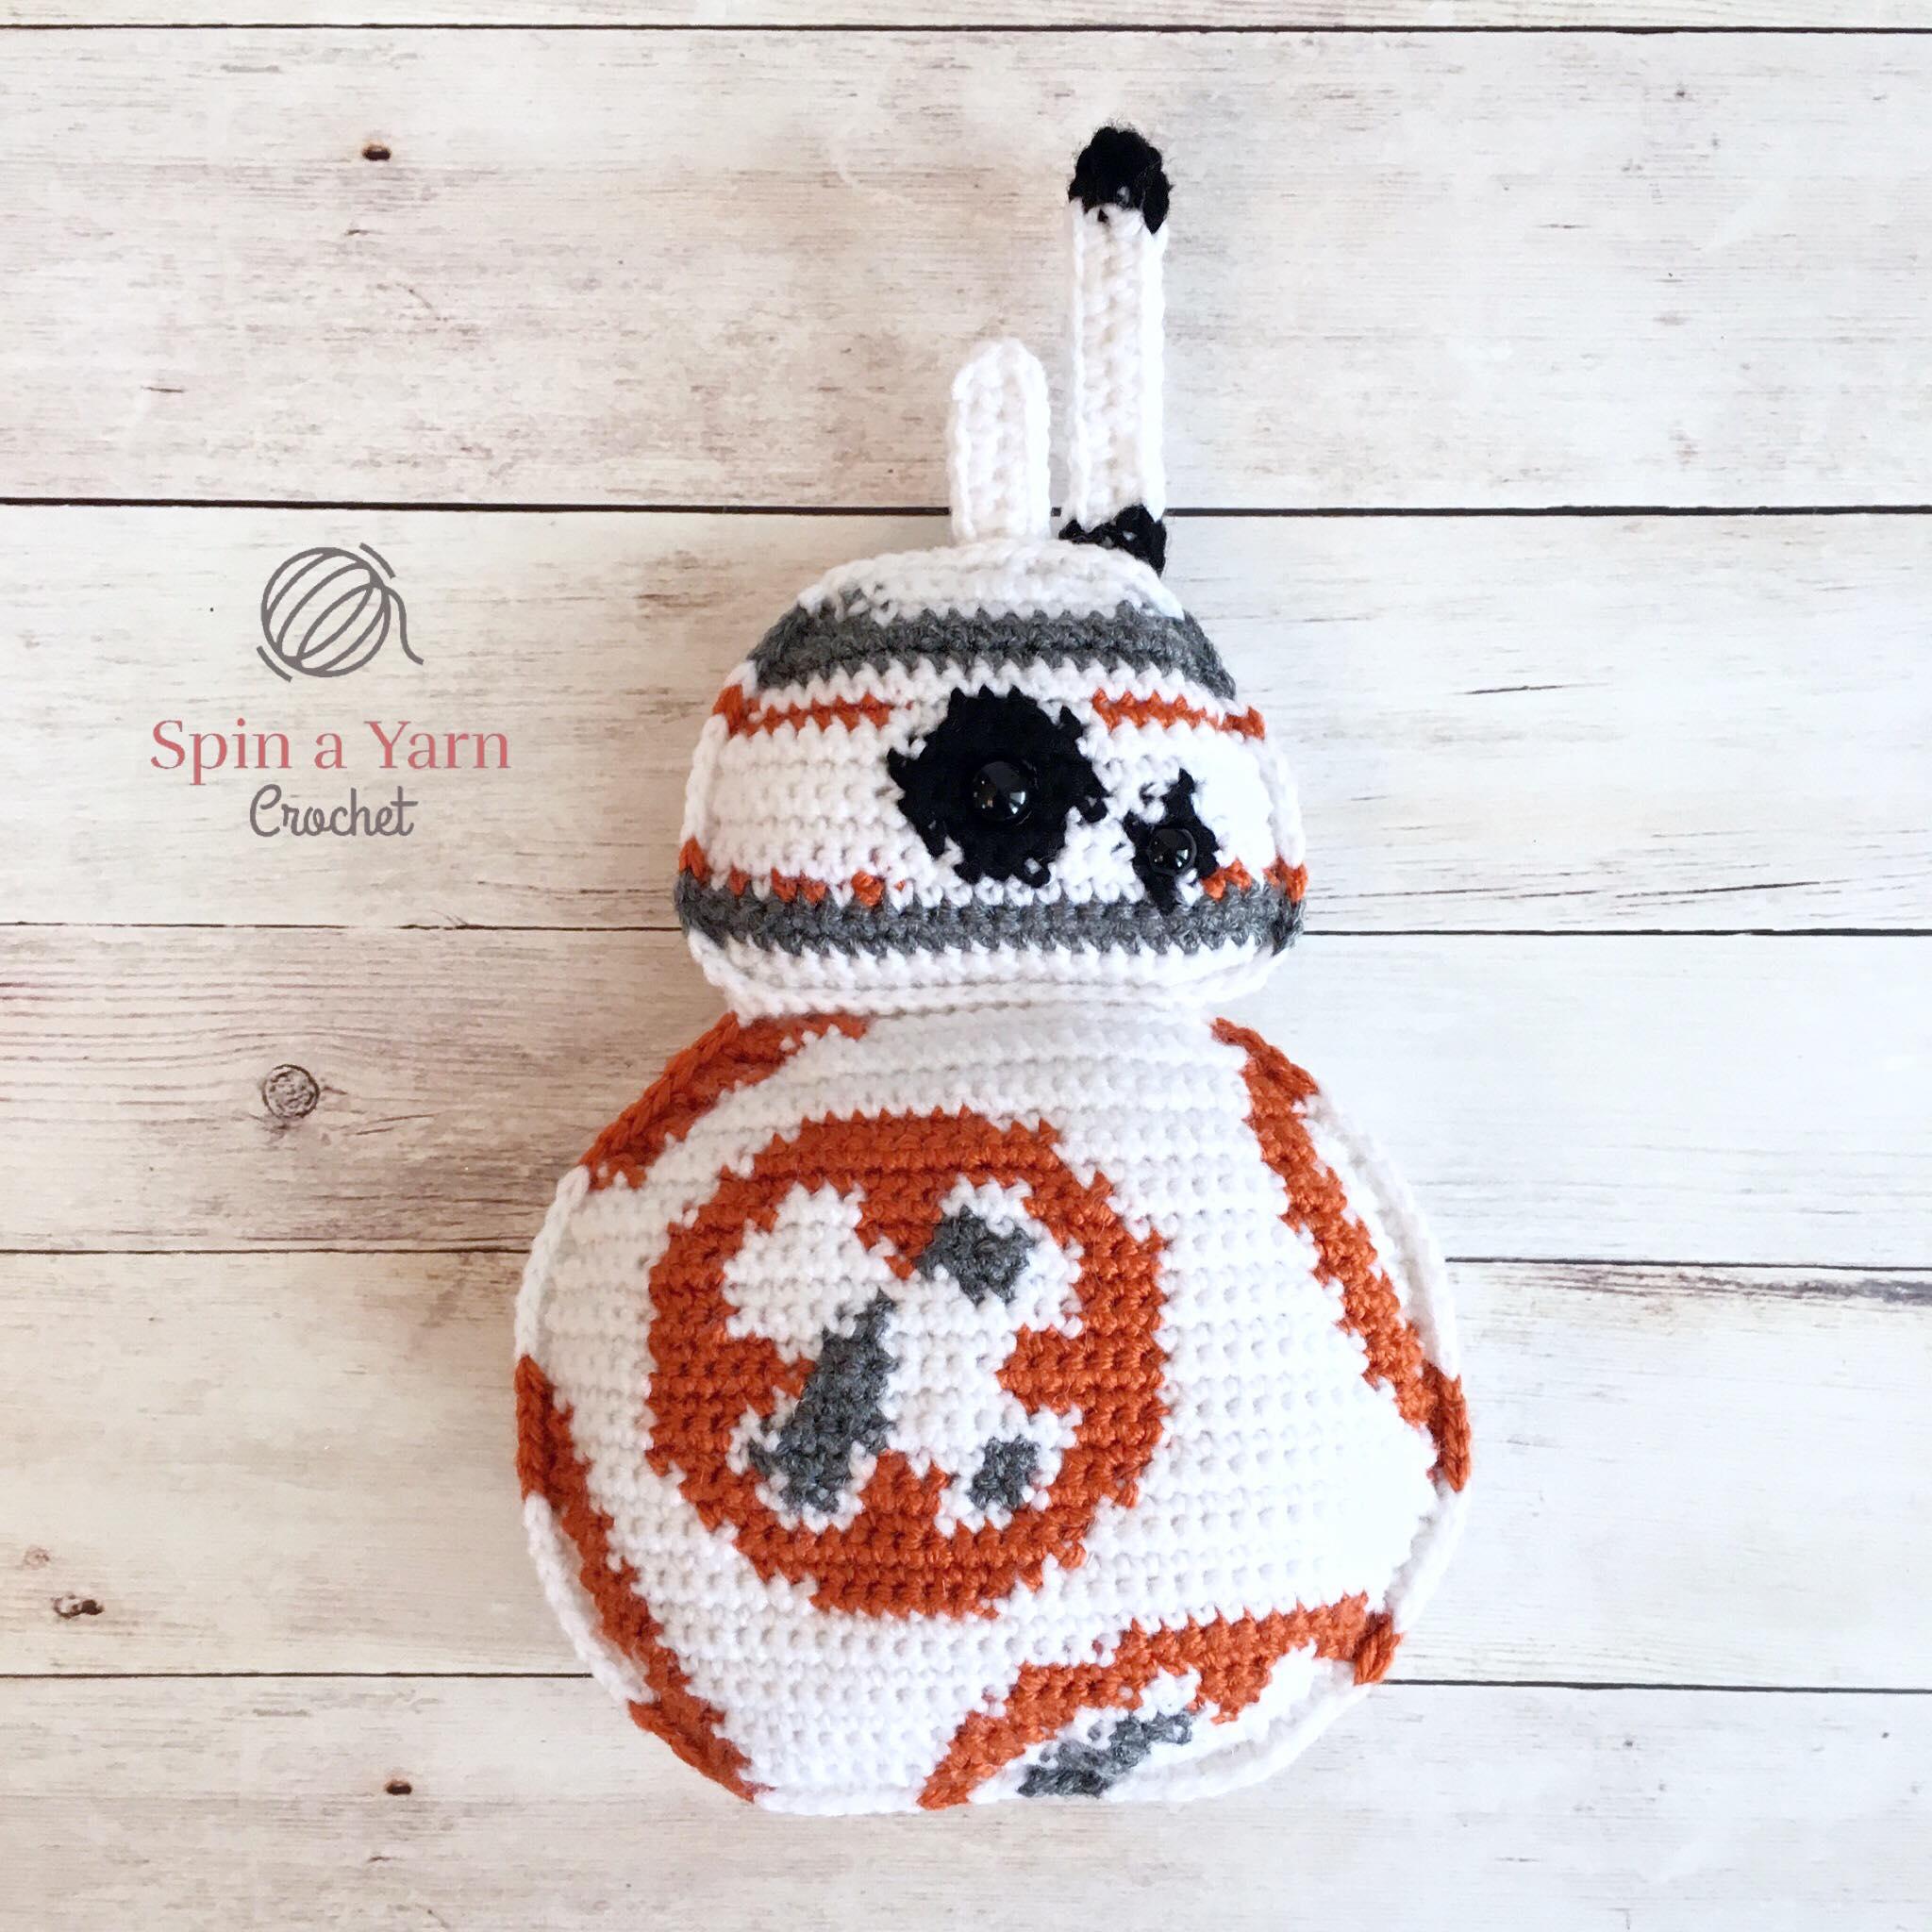 Star Wars Crochet Archives Spin A Yarn Crochet